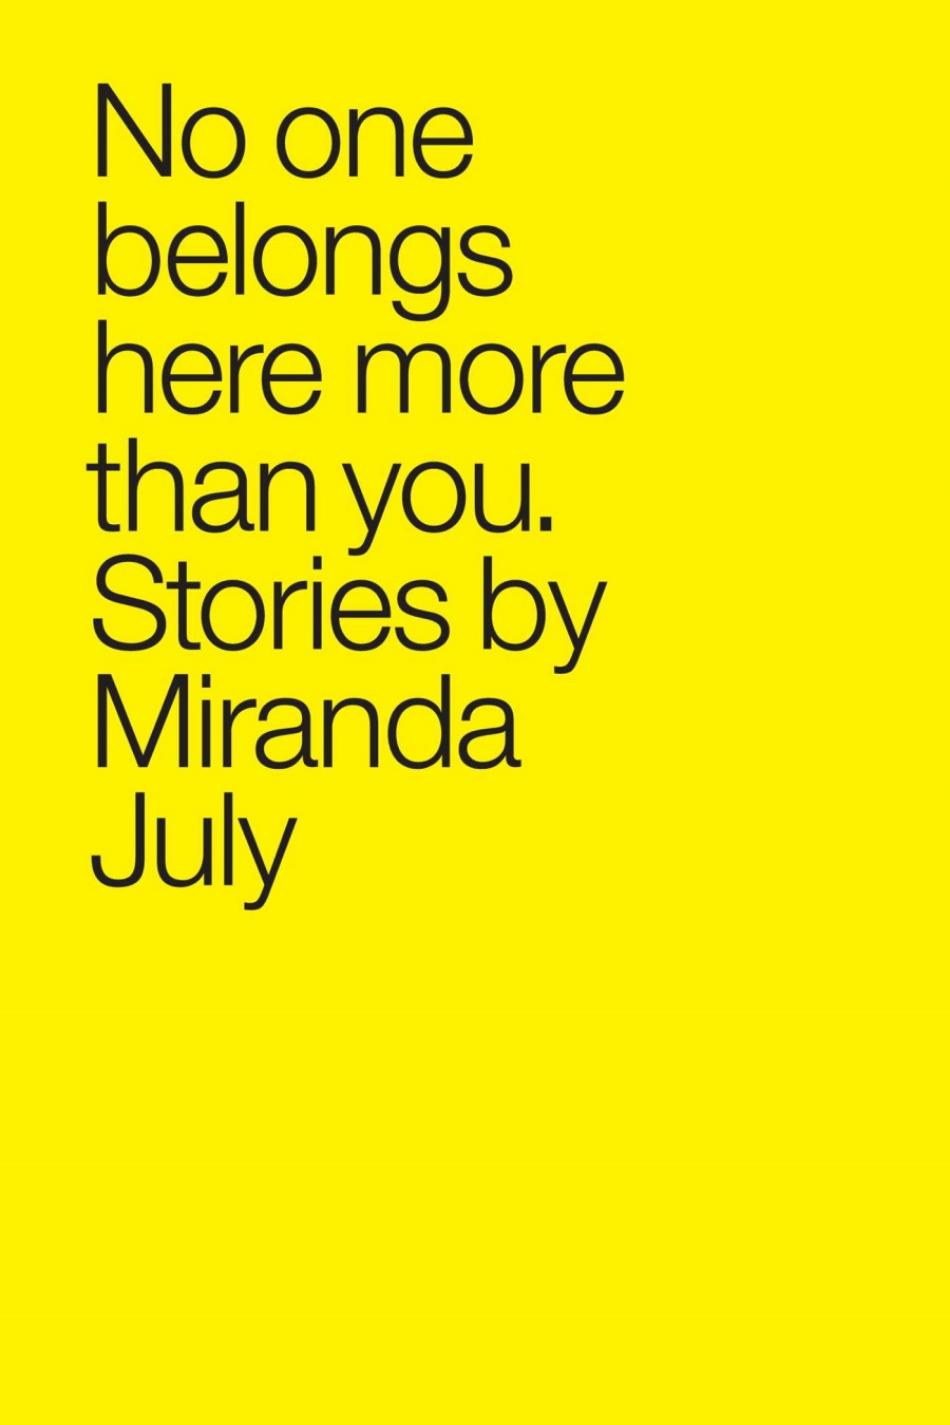 no one belongs here more than you miranda july